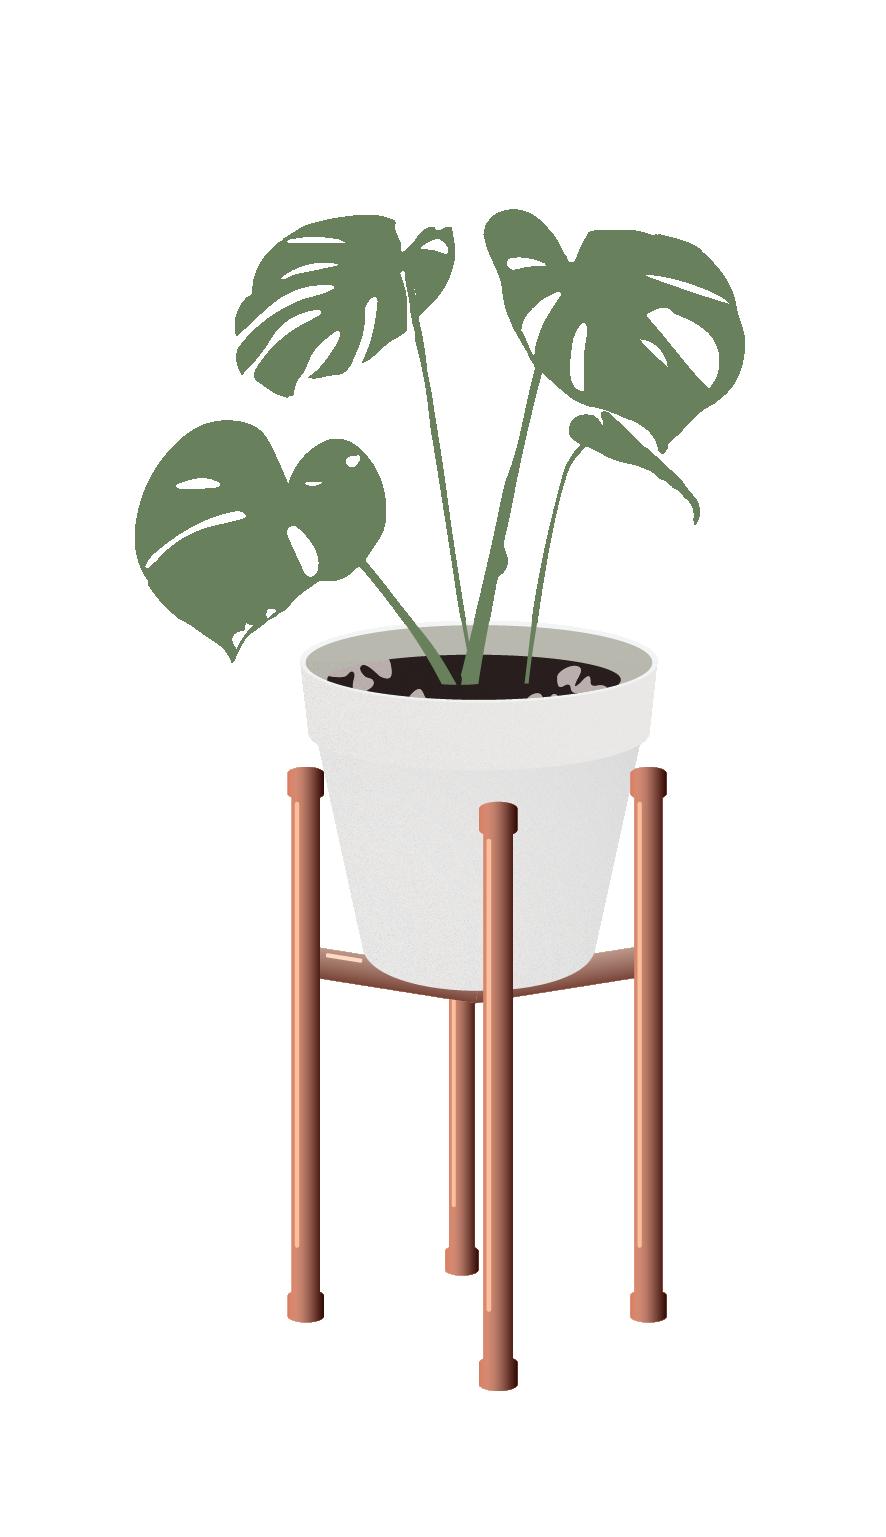 Pin De Novita Setyawati Em Hiasan Ilustracao De Plantas Desenhos De Flores Colagem